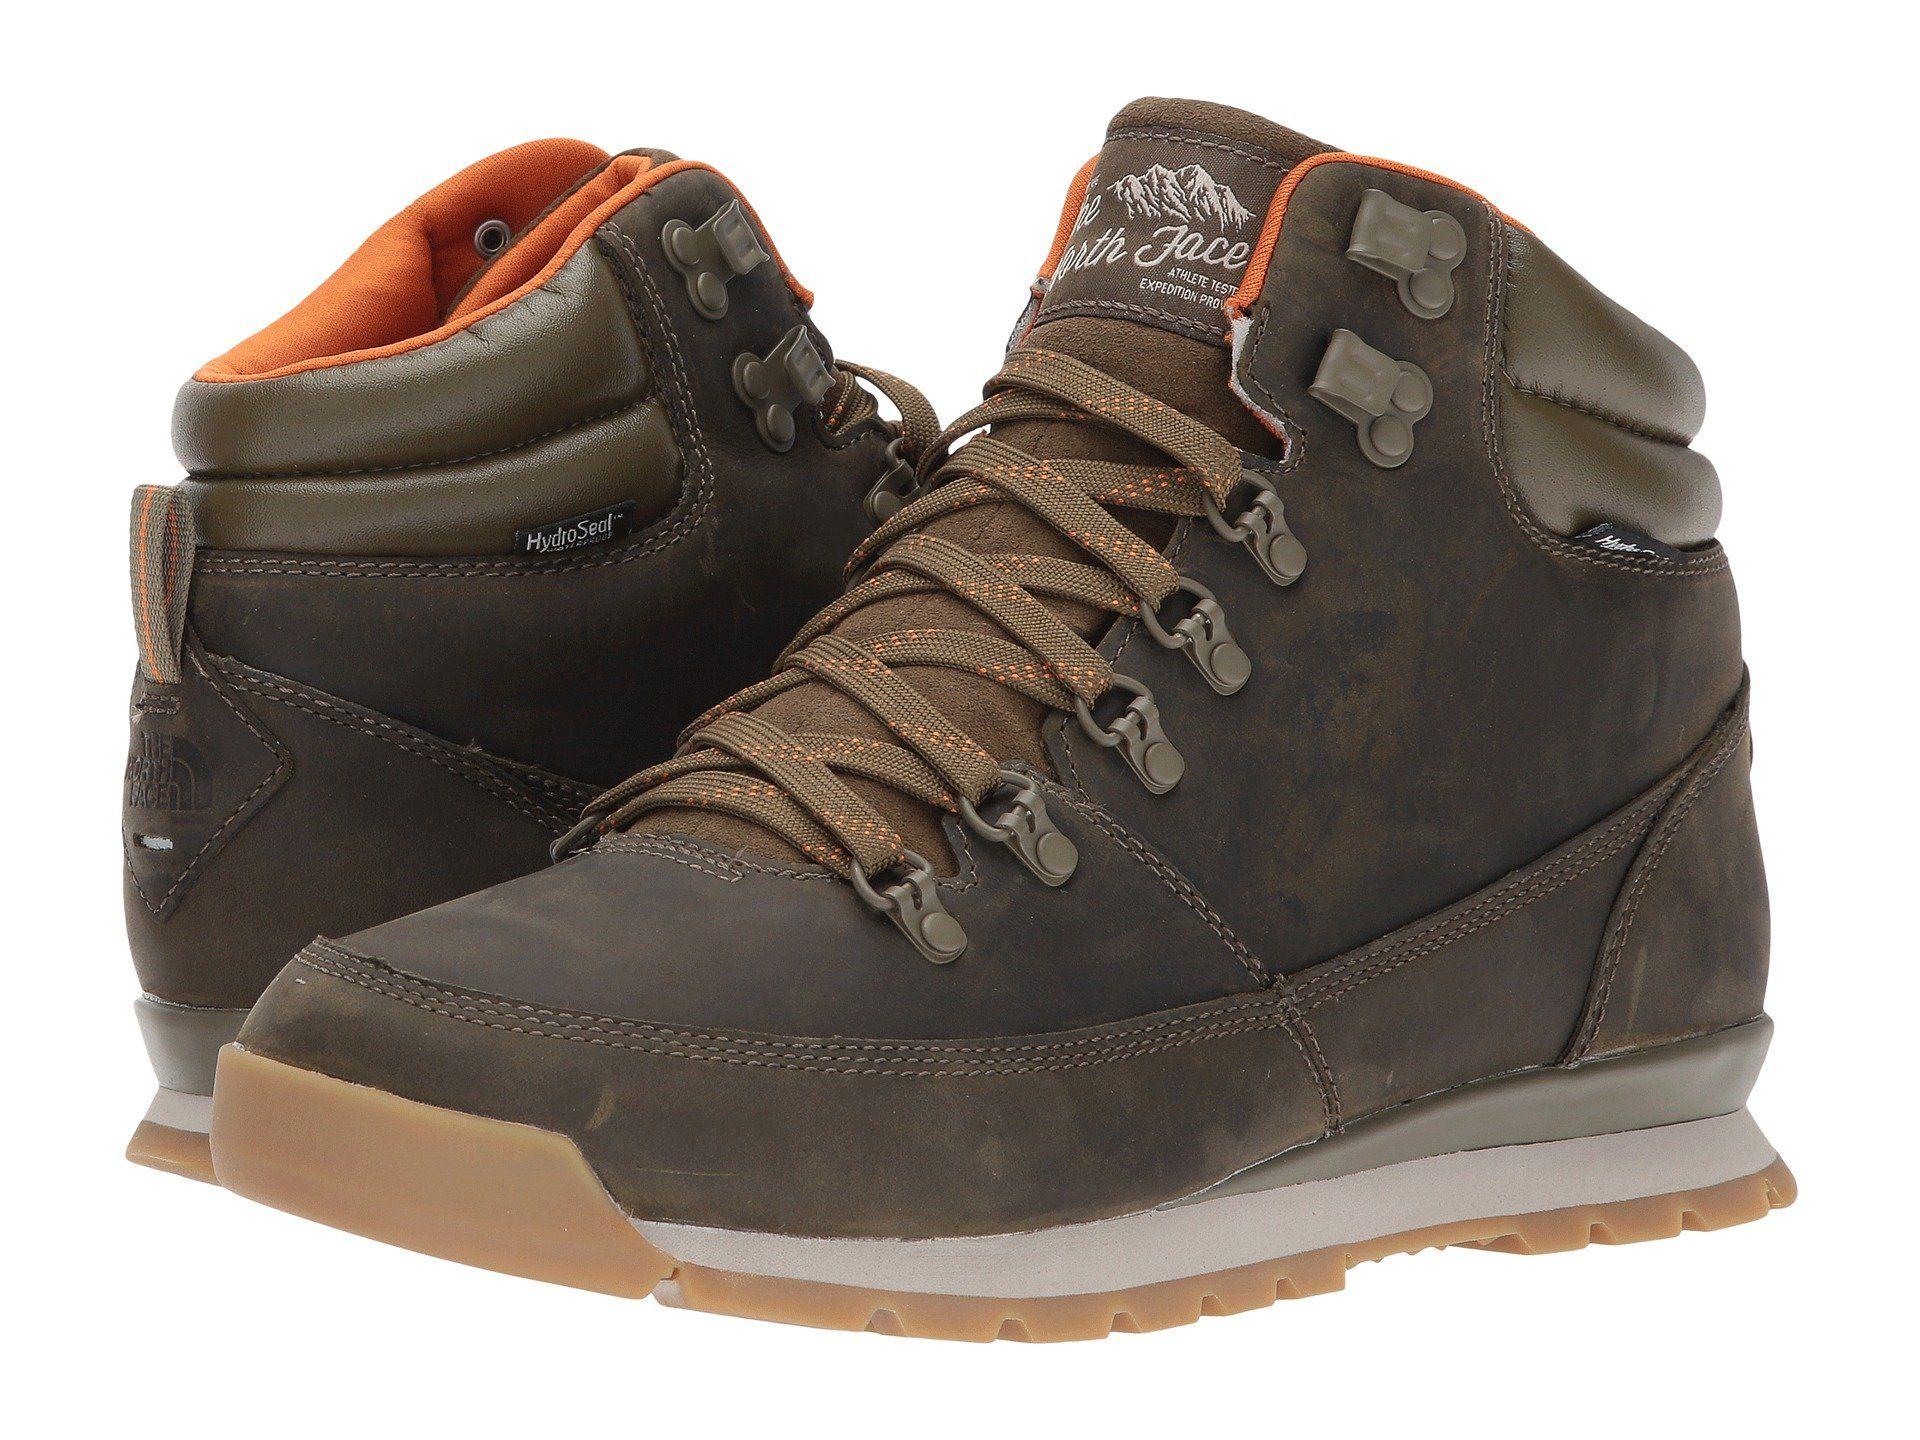 speedfit 2. hiking boots